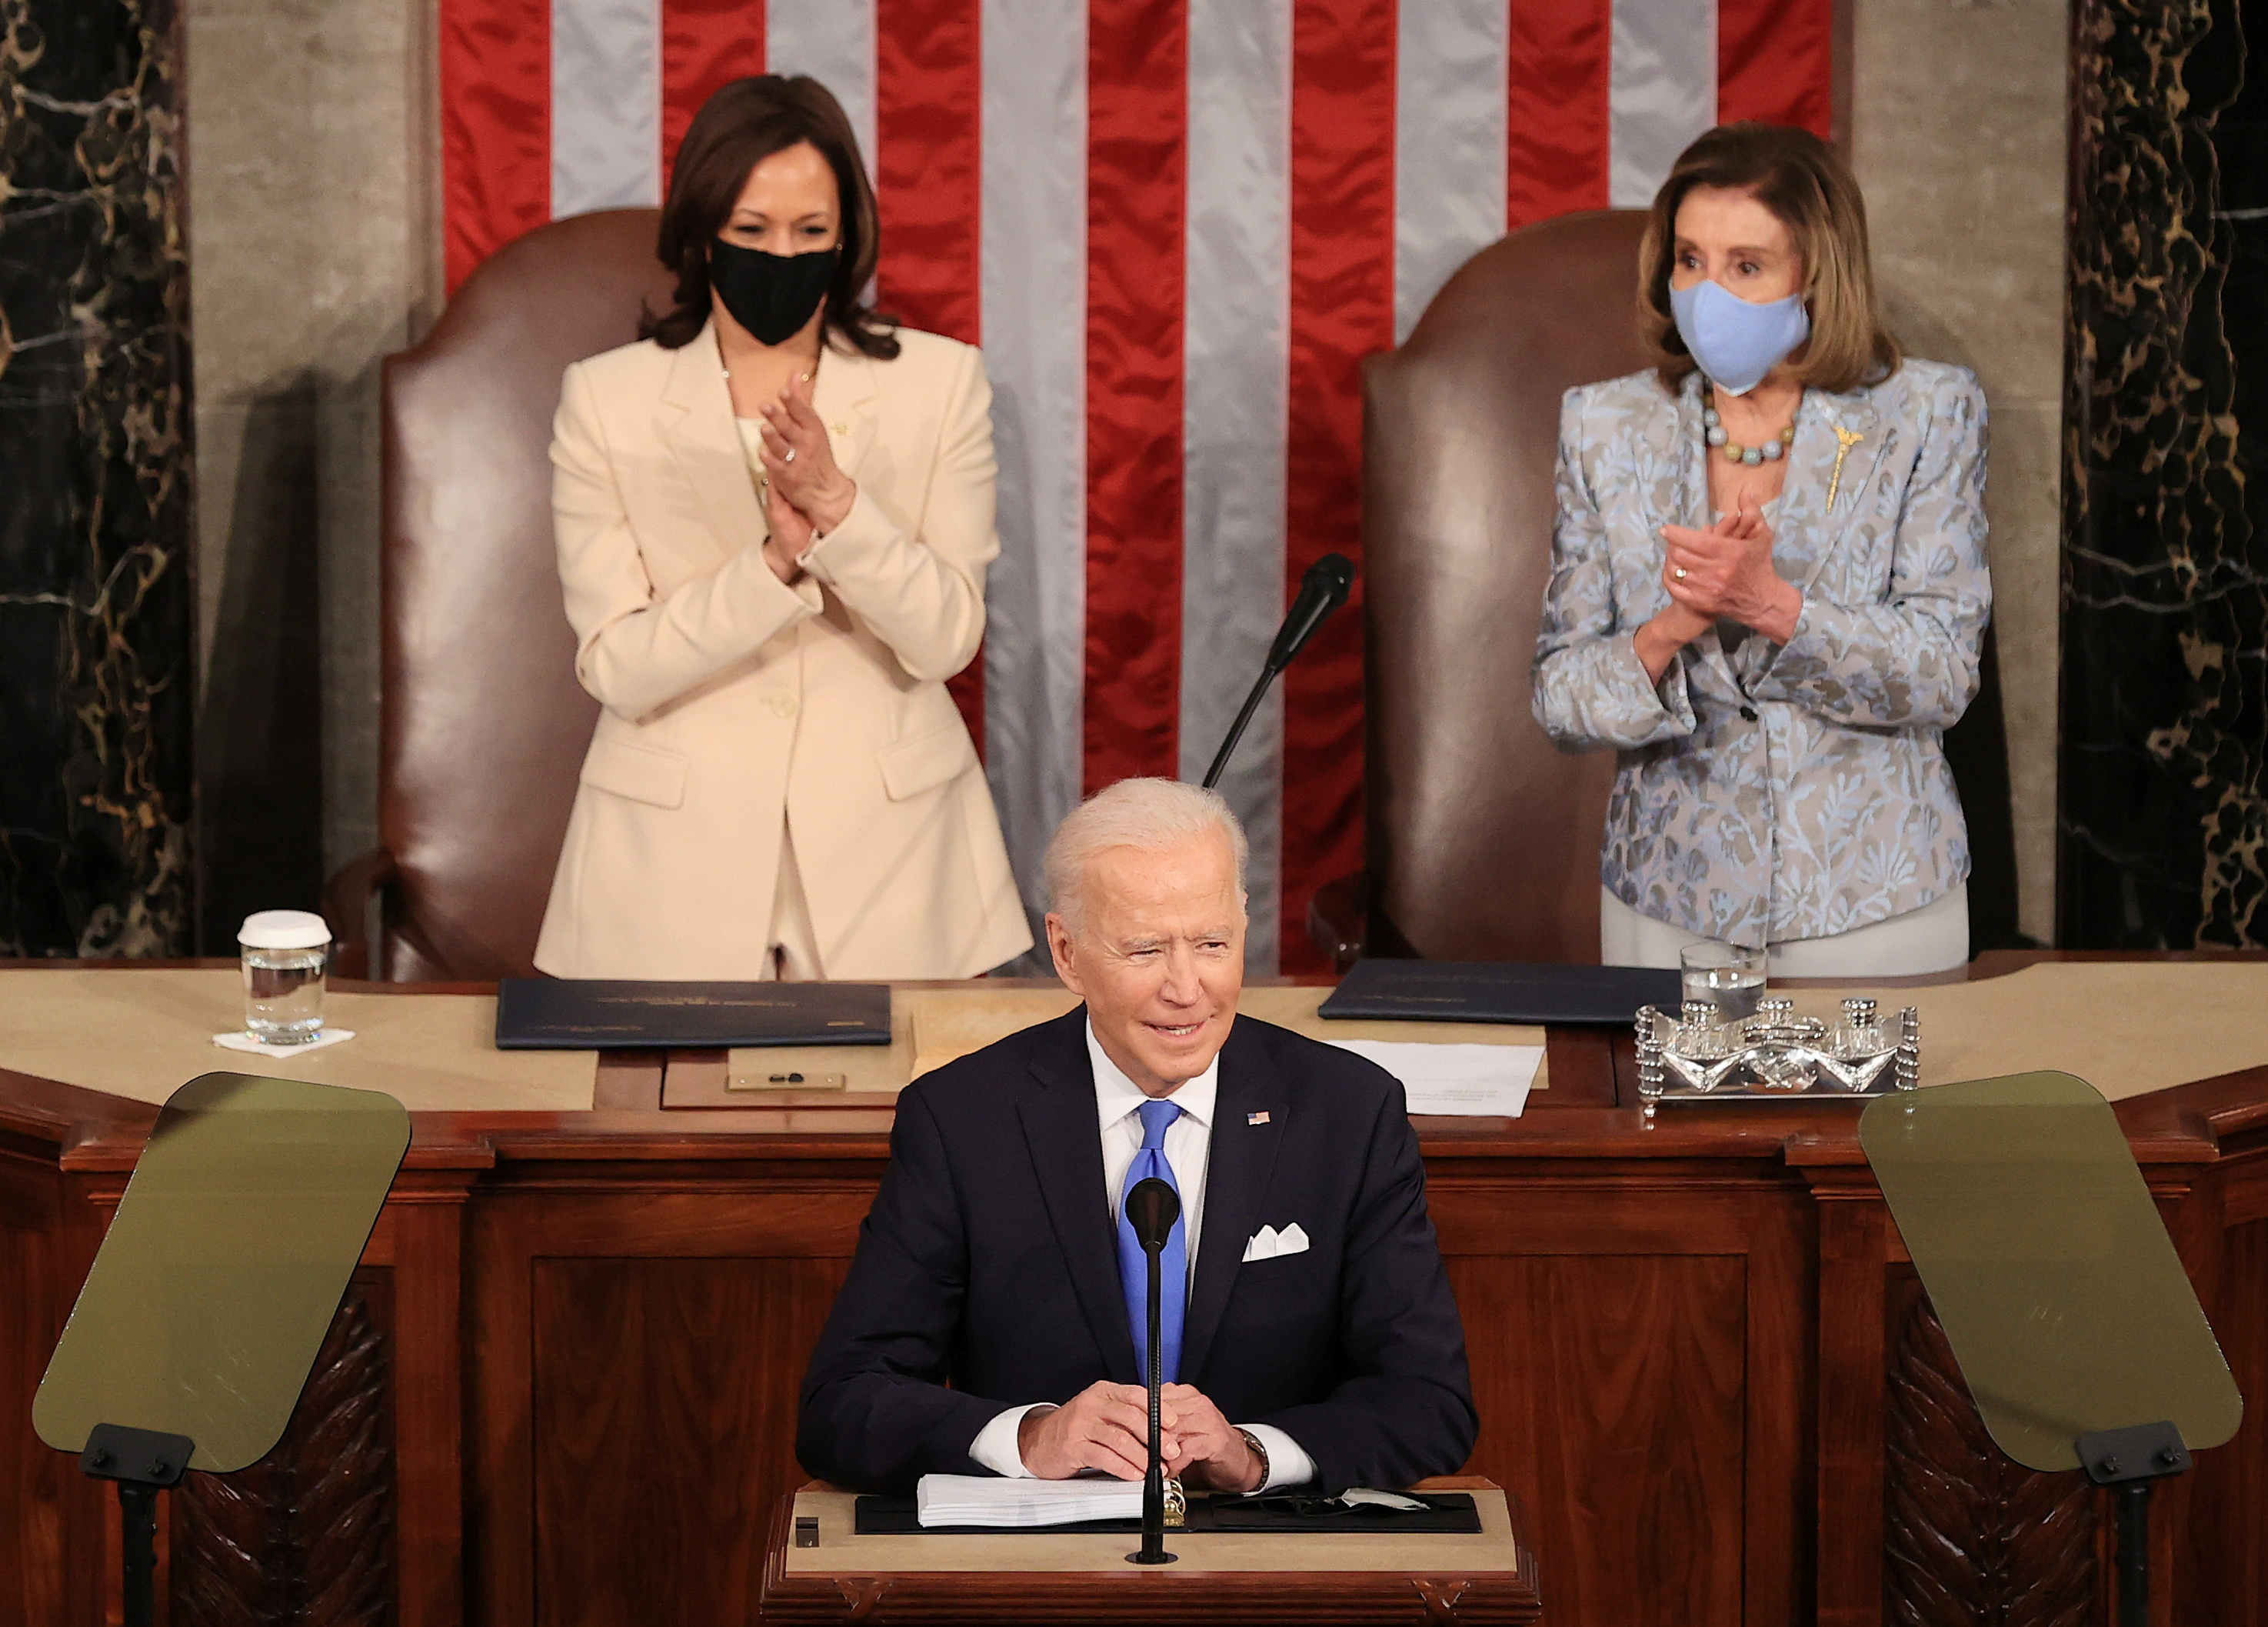 U.S. President Joe Biden addresses a joint session of Congress as President Kamala Harris and Speaker of the House U.S. Rep. Nancy Pelosi (D-CA) react in the U.S. Capitol in Washington, DC, U.S. April 28, 2021. Chip Somodevillaat/Pool via REUTERS